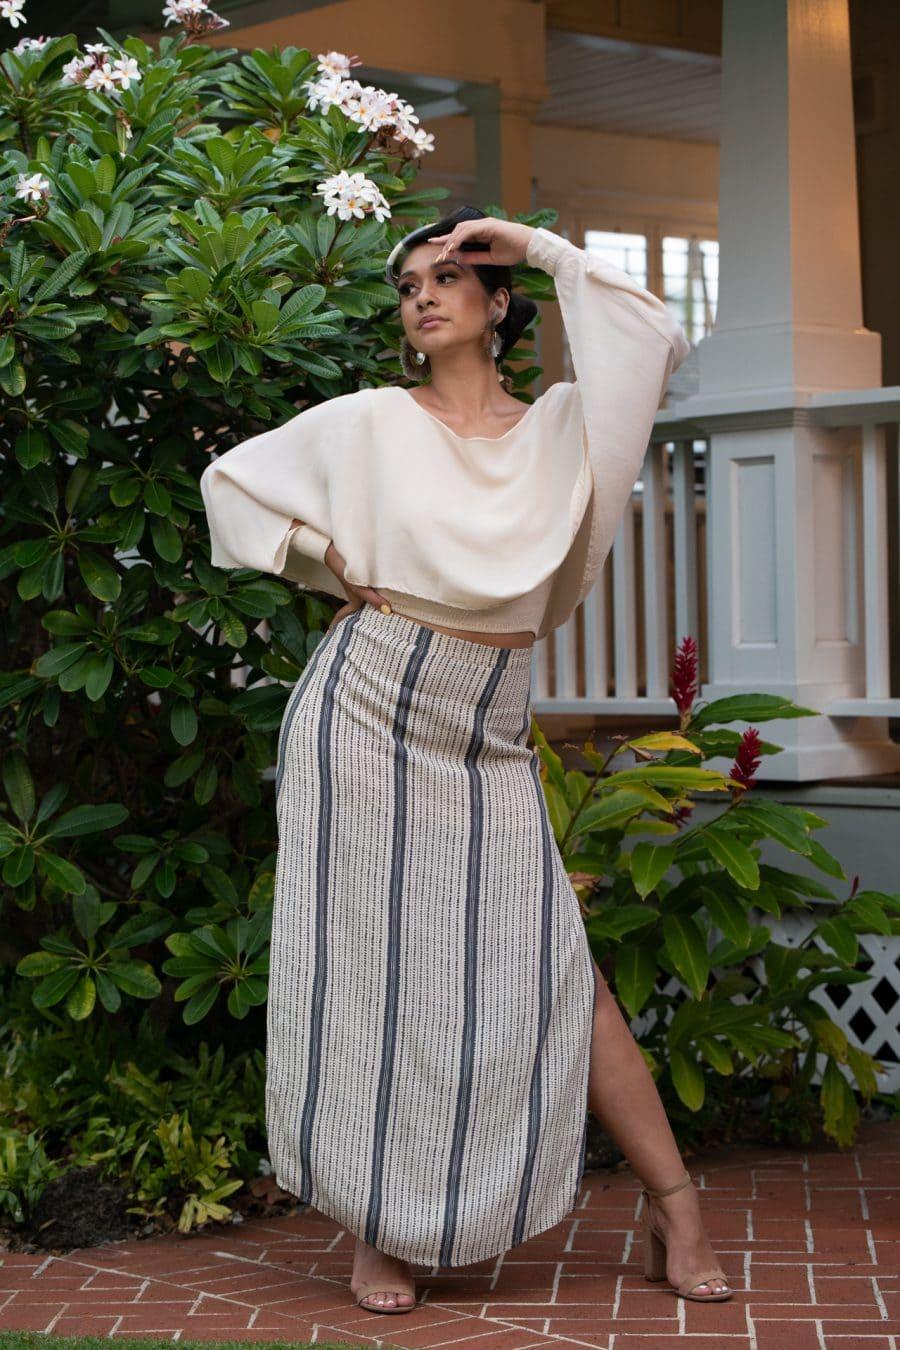 Model wearing Kahiki Skirt Long in Pavement Moonbeam Hoonionio Pattern - Front View